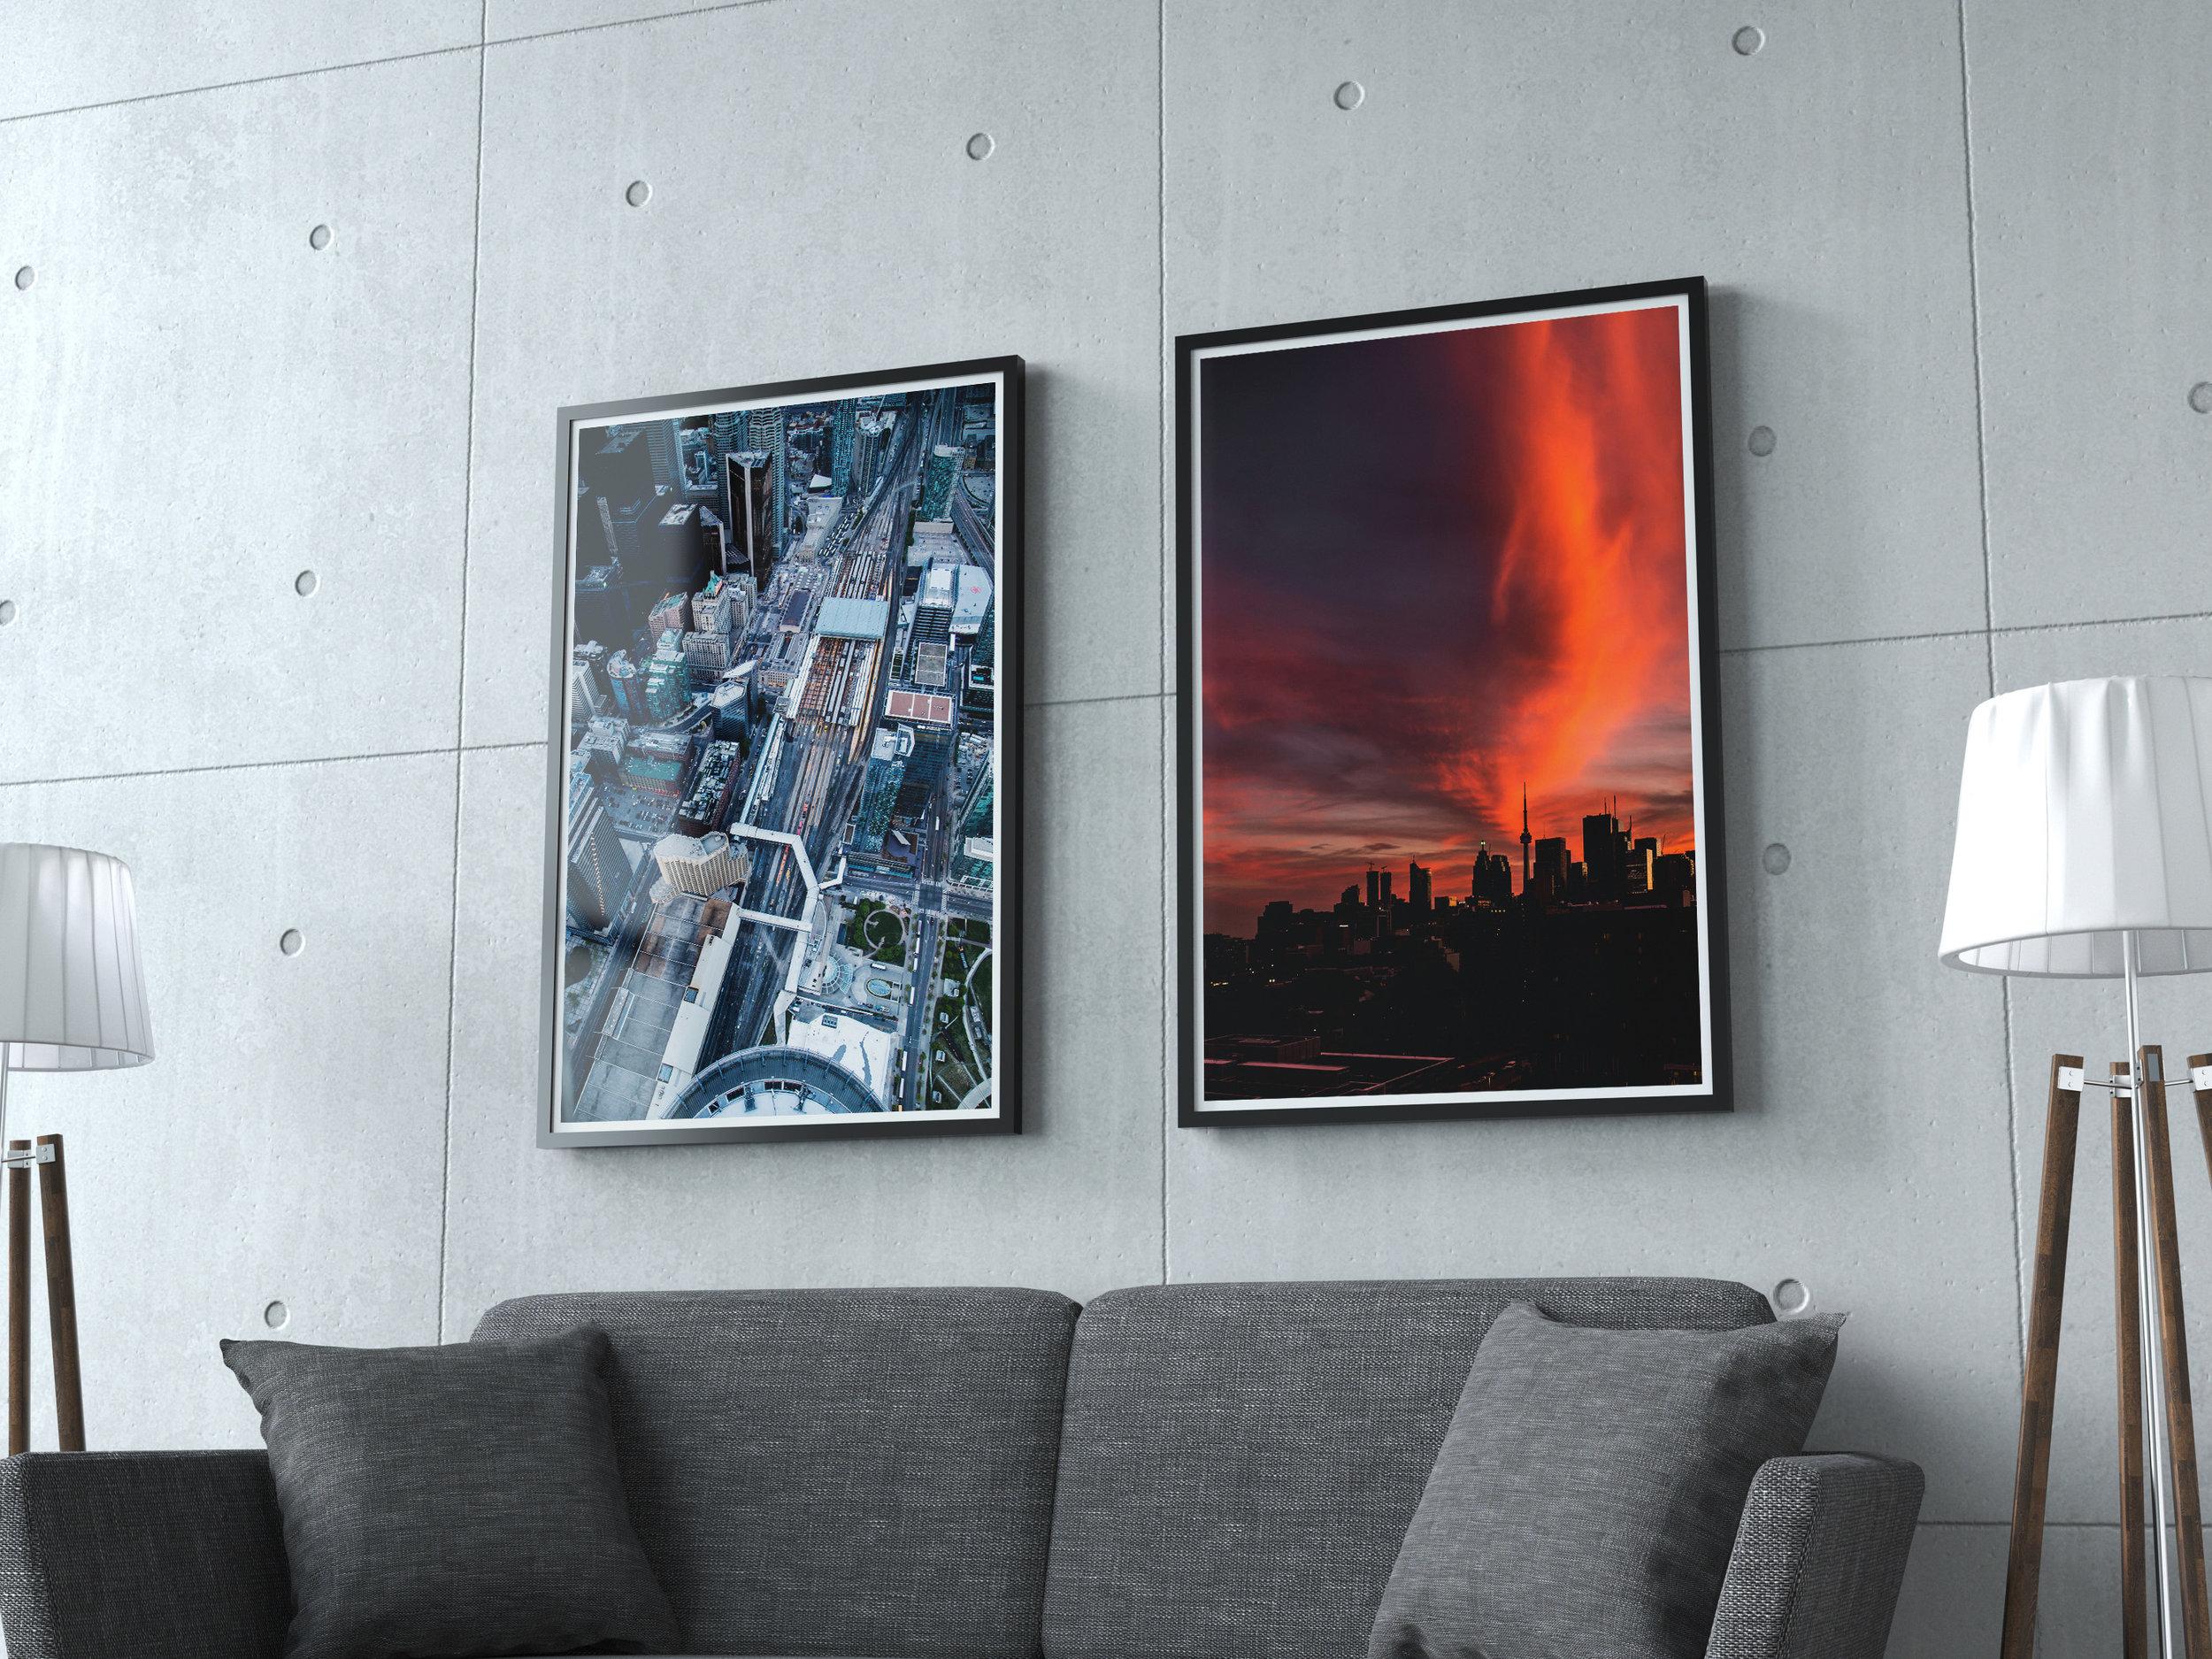 yyz-exposed-main-living-room.jpg